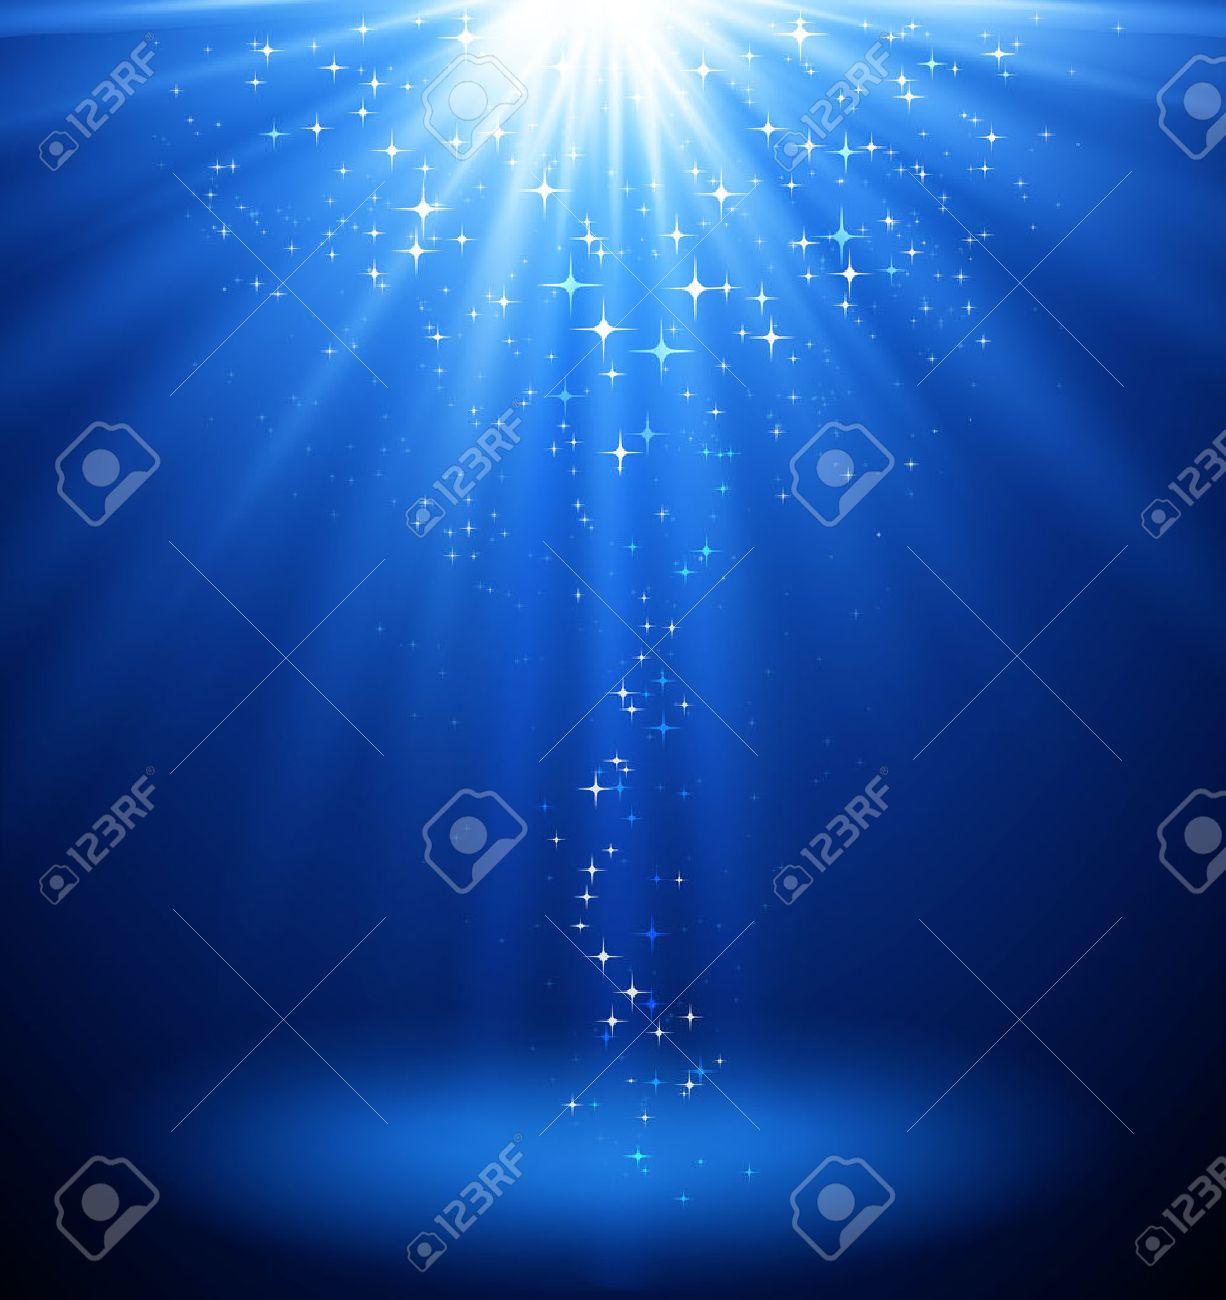 Abstract magic light background. Blue holiday burst. Blur light - 56199558